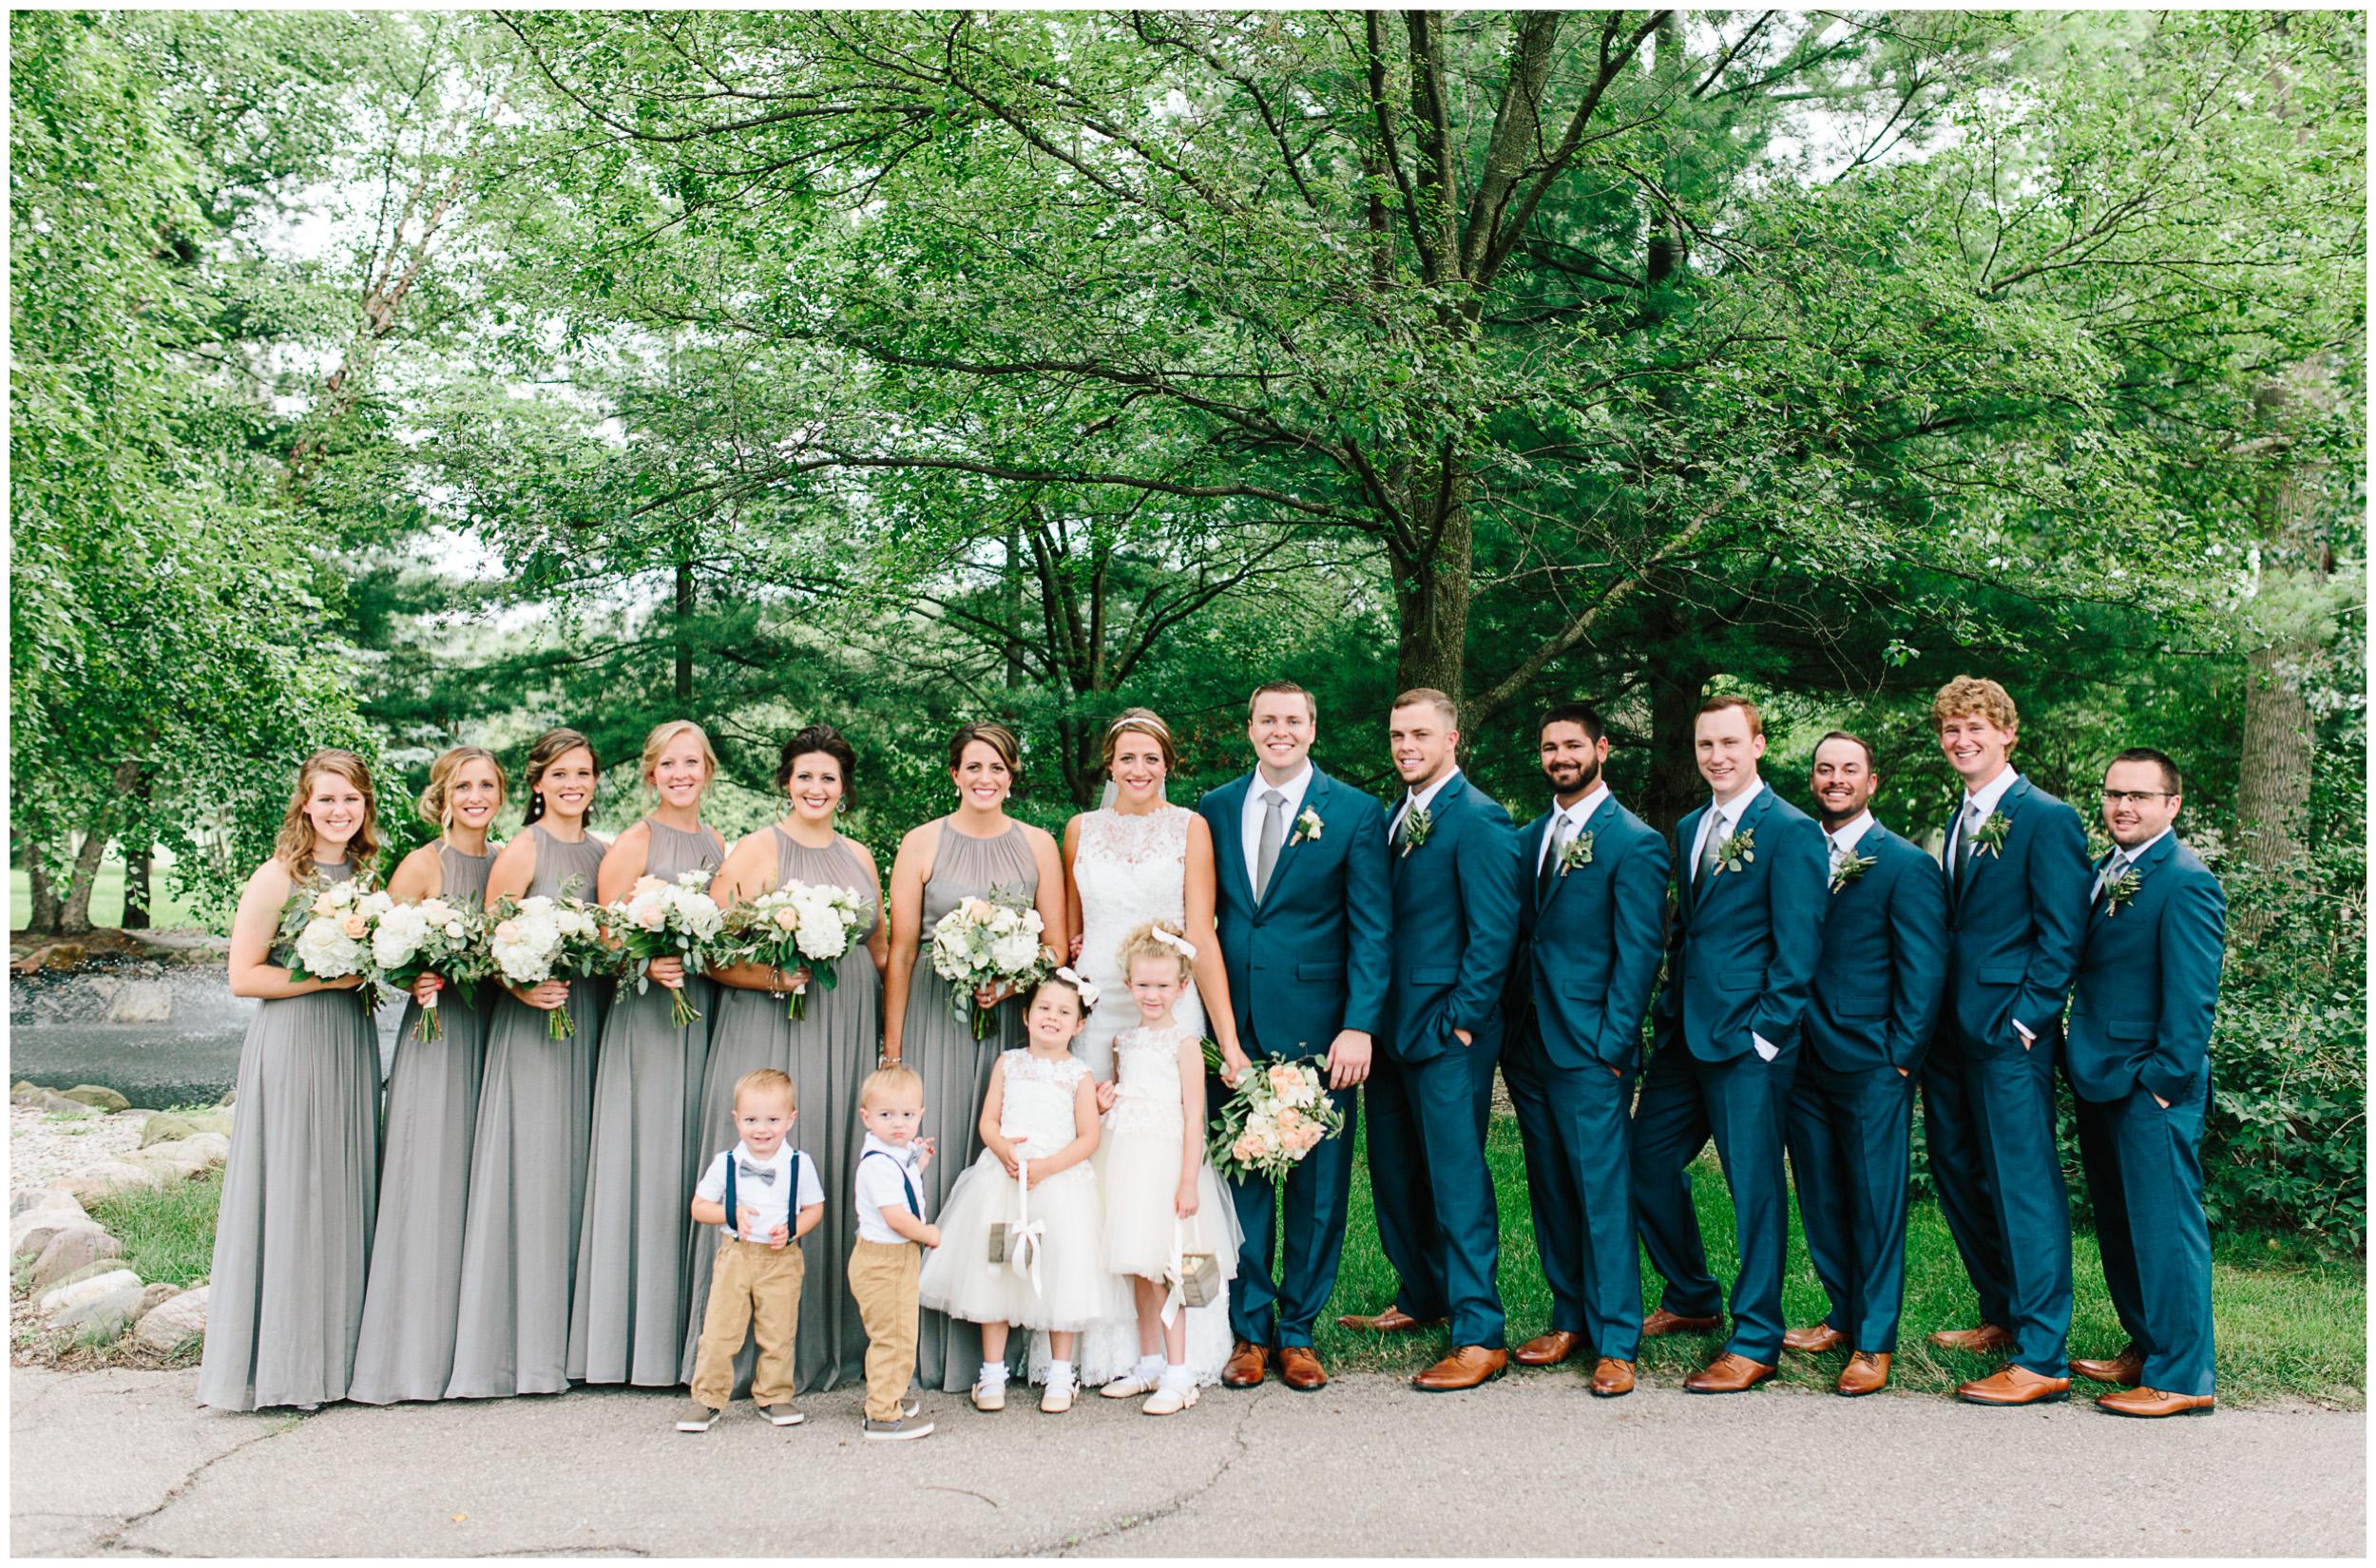 ann_arbor_michigan_wedding_54.jpg